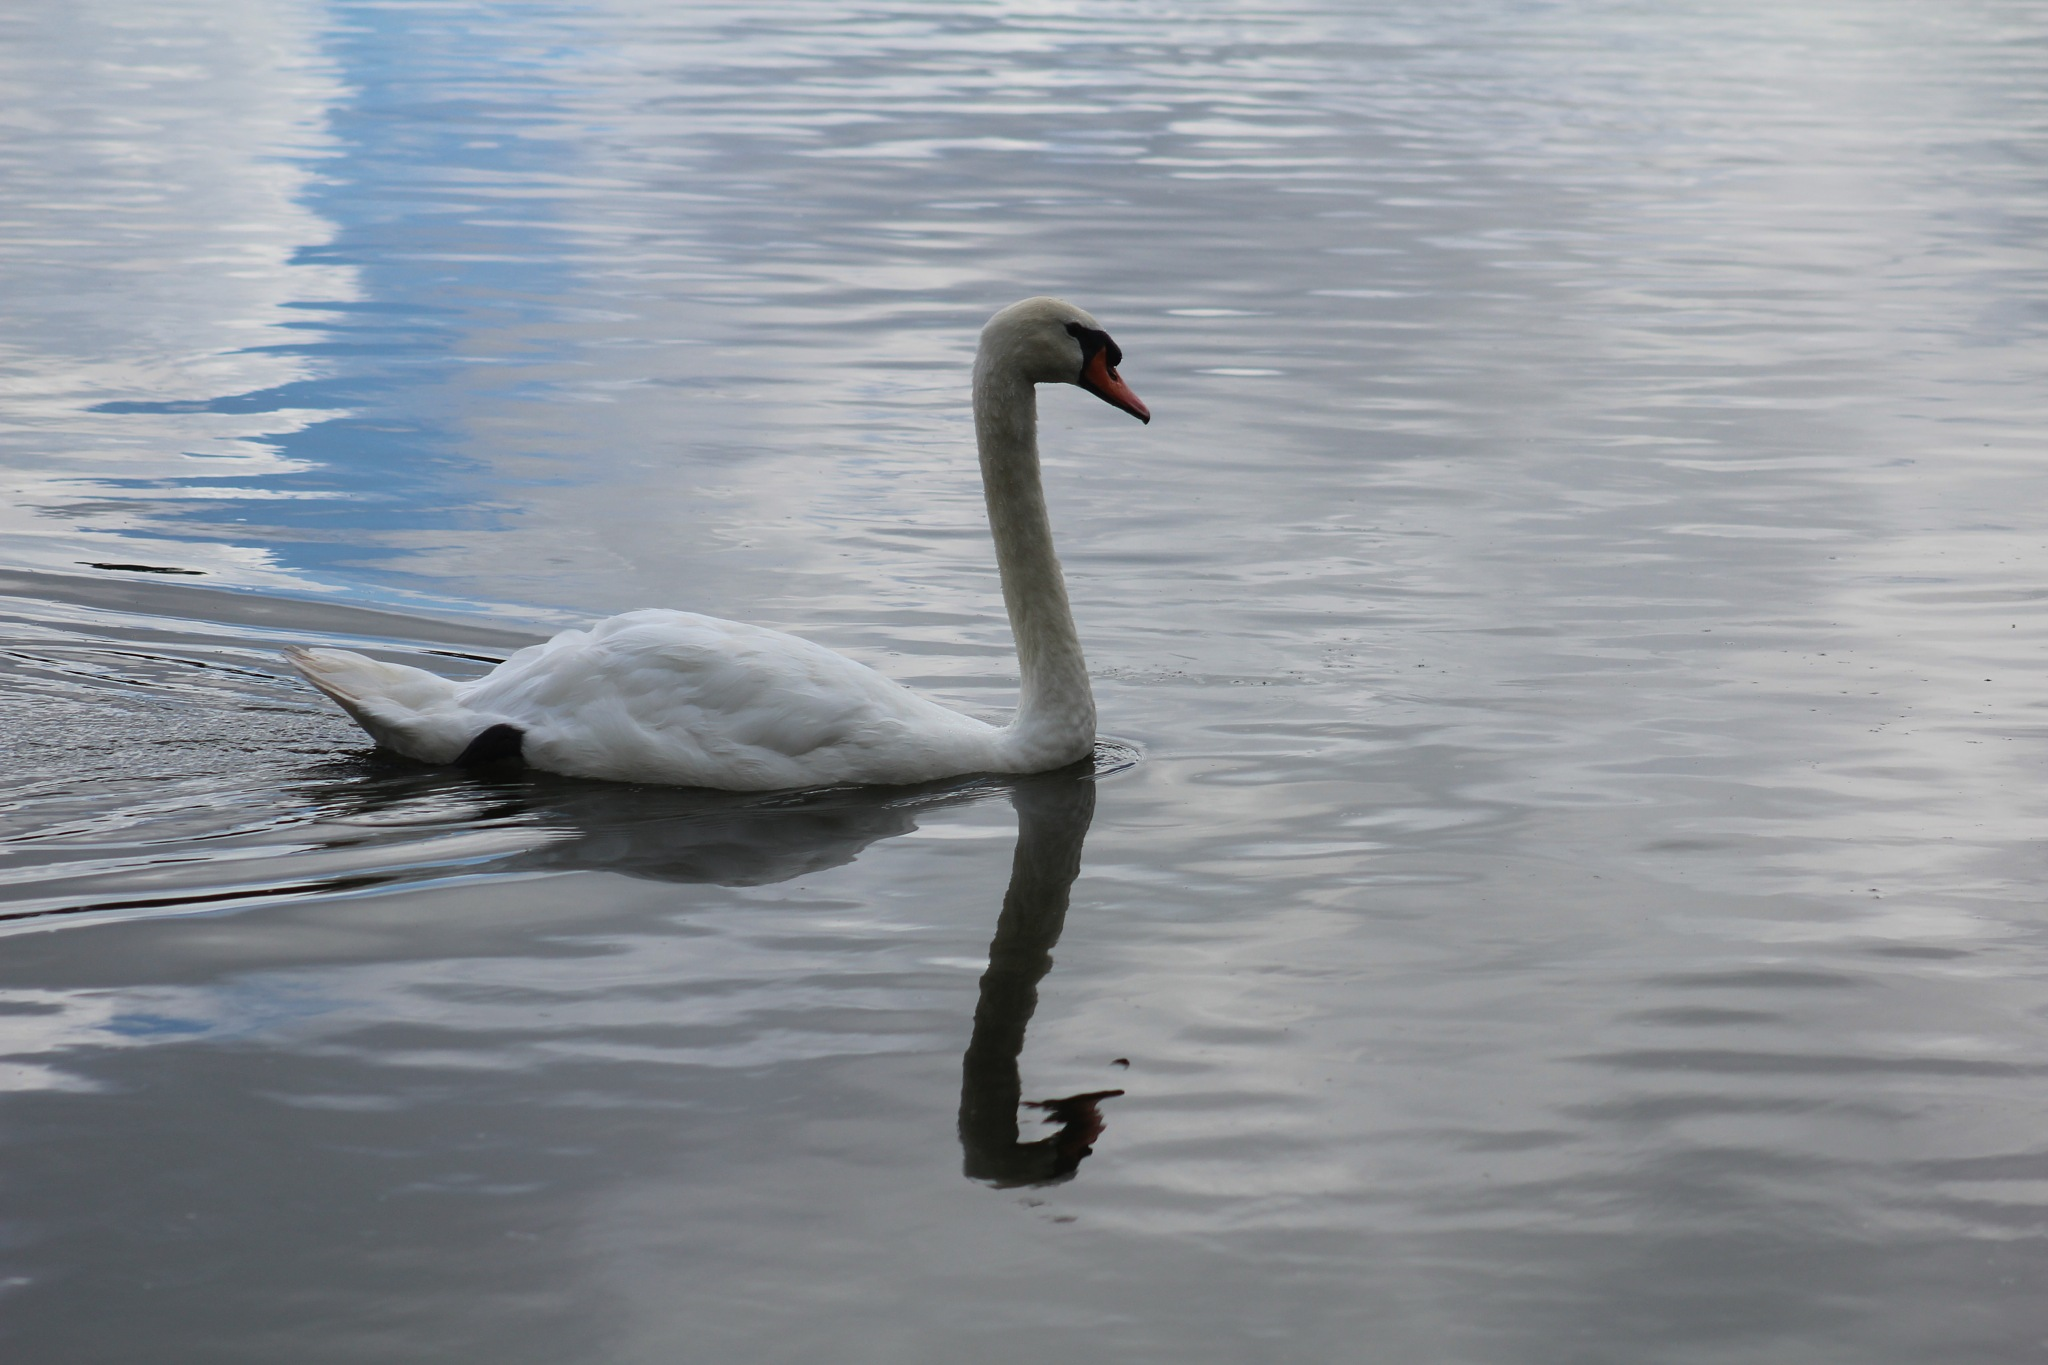 Swan  Reflection by Diane.Mumbower